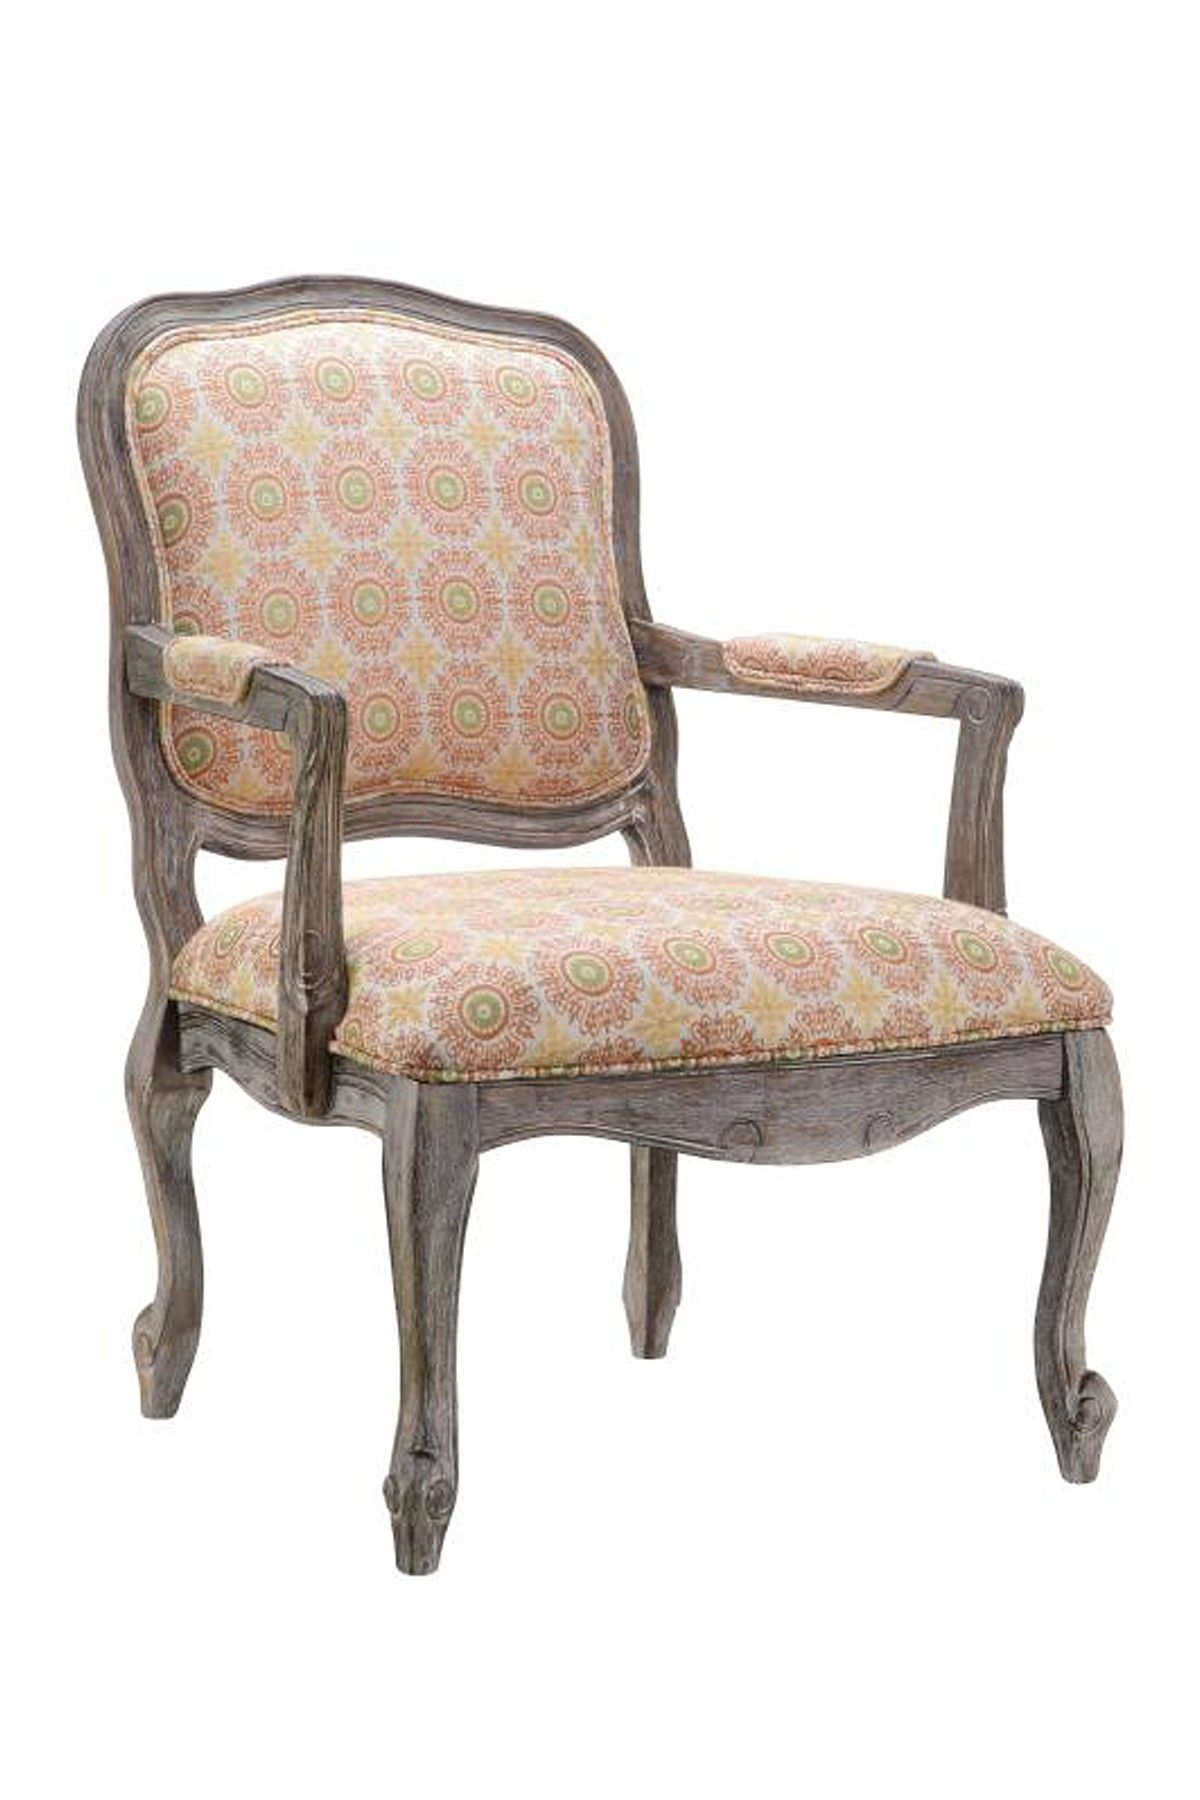 Antoinette Melon Chair Accent Chairs Chair Armchair